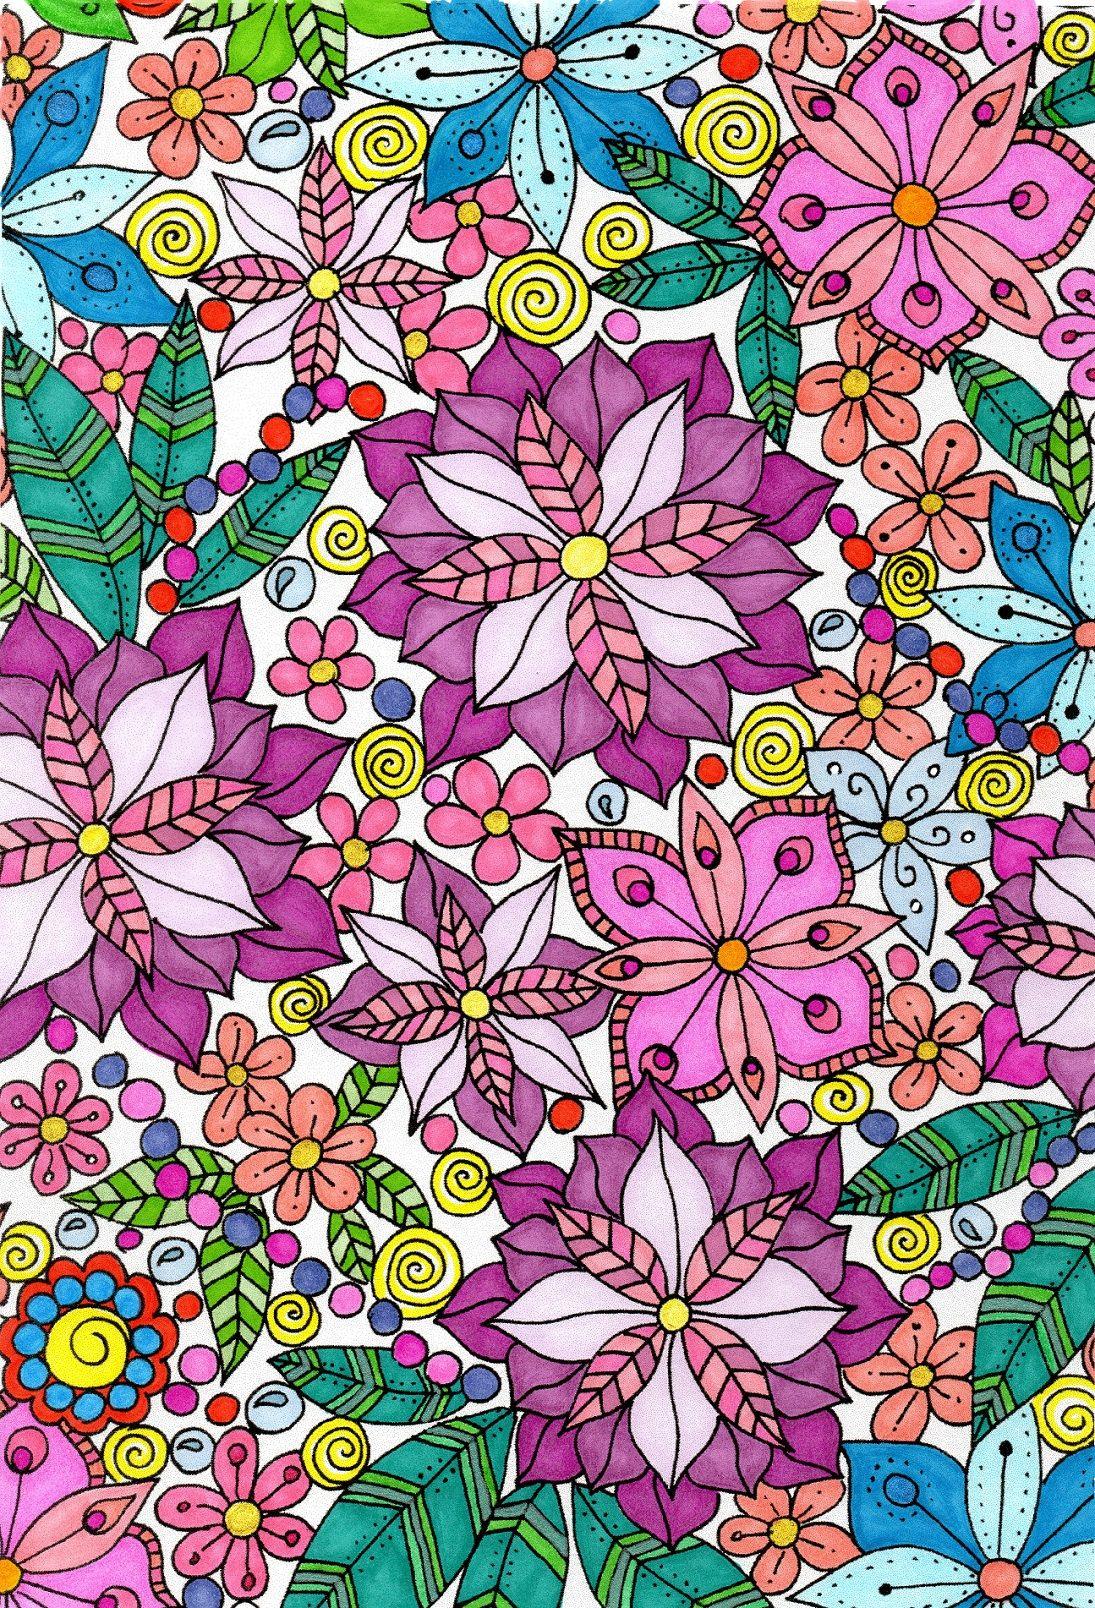 Zendoodle coloring enchanting gardens - Original Drawing From Zendoodle Coloring By Nikolett Corley